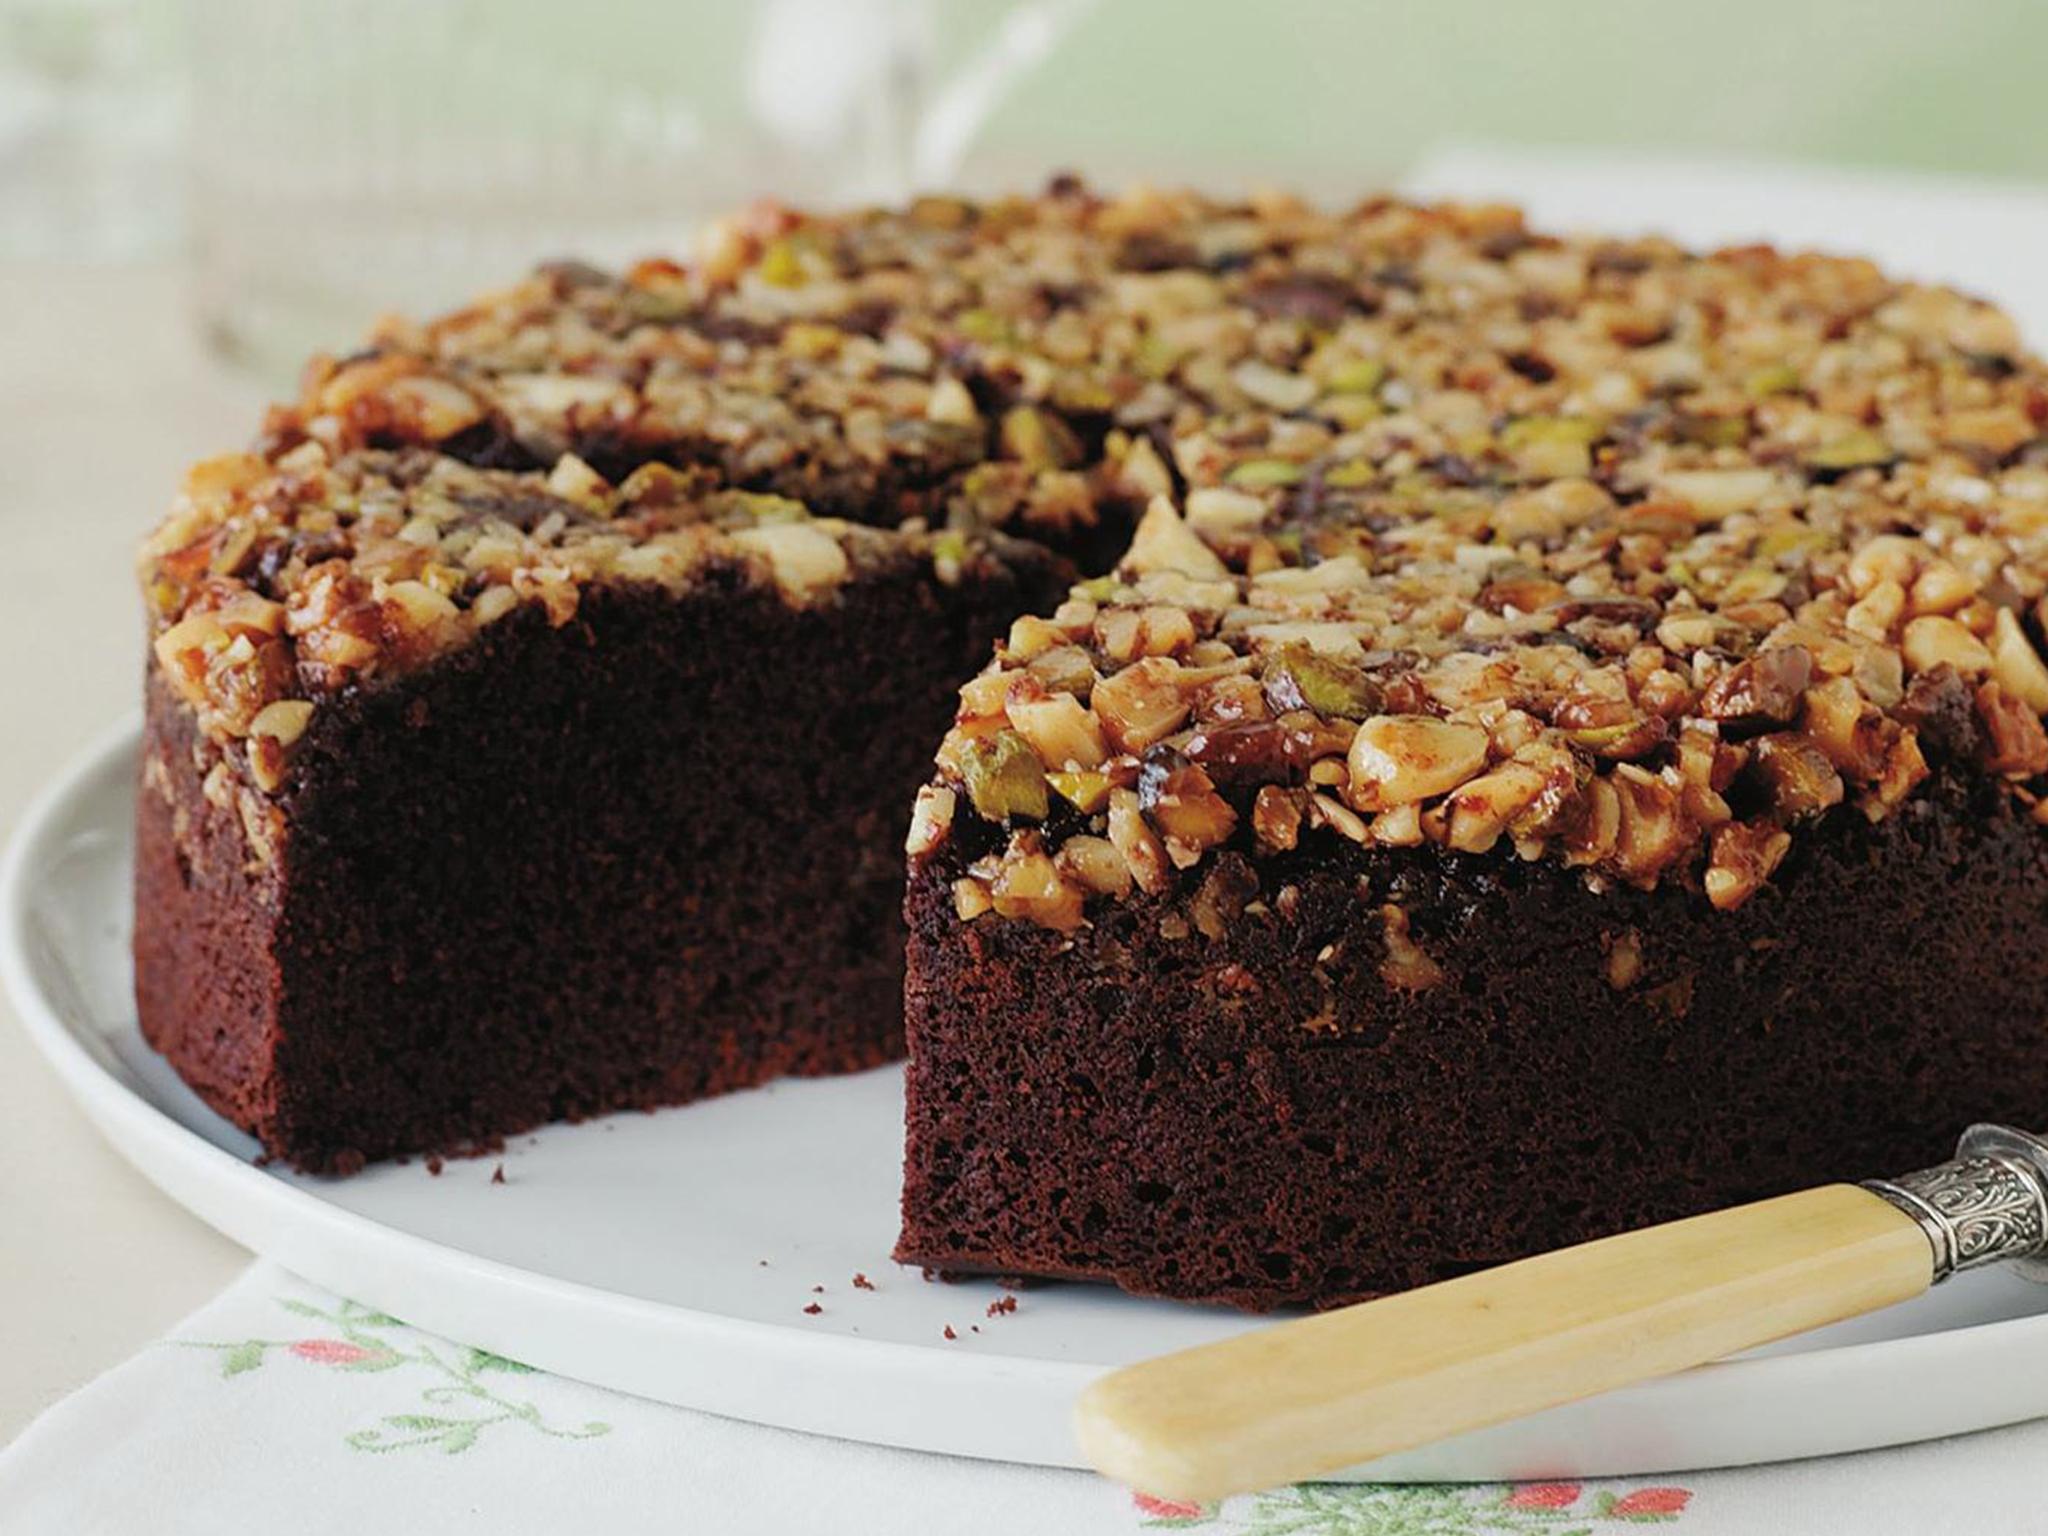 Caramel nut cake recipe